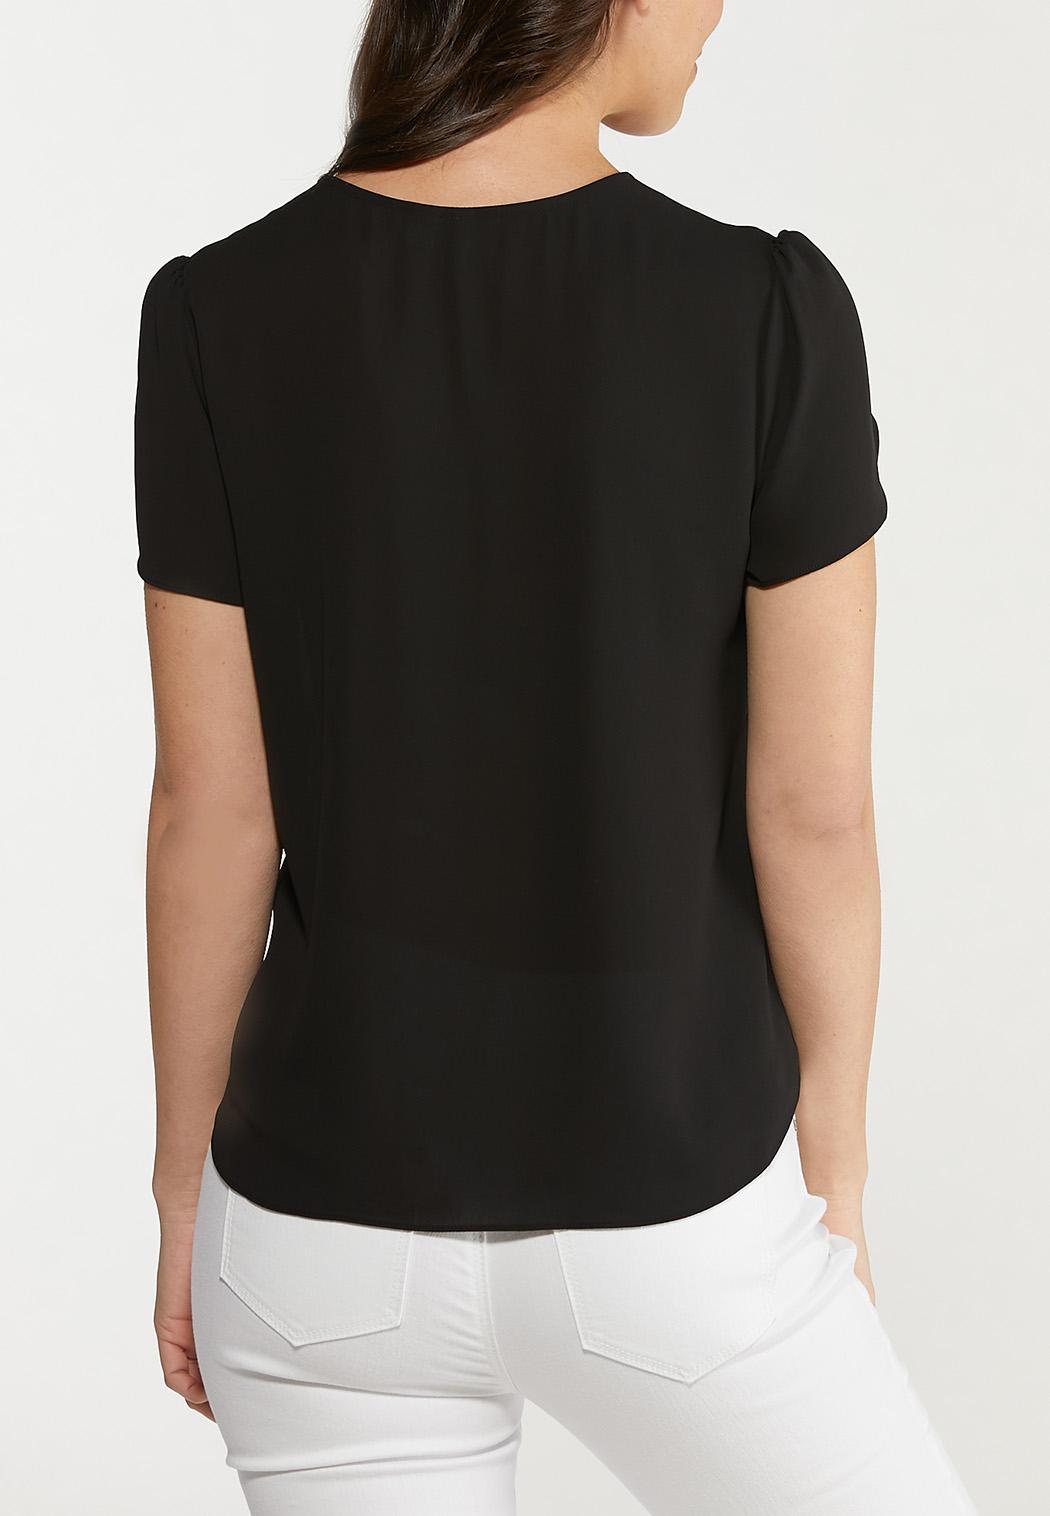 Plus Size Tulip Sleeve Top (Item #44536990)